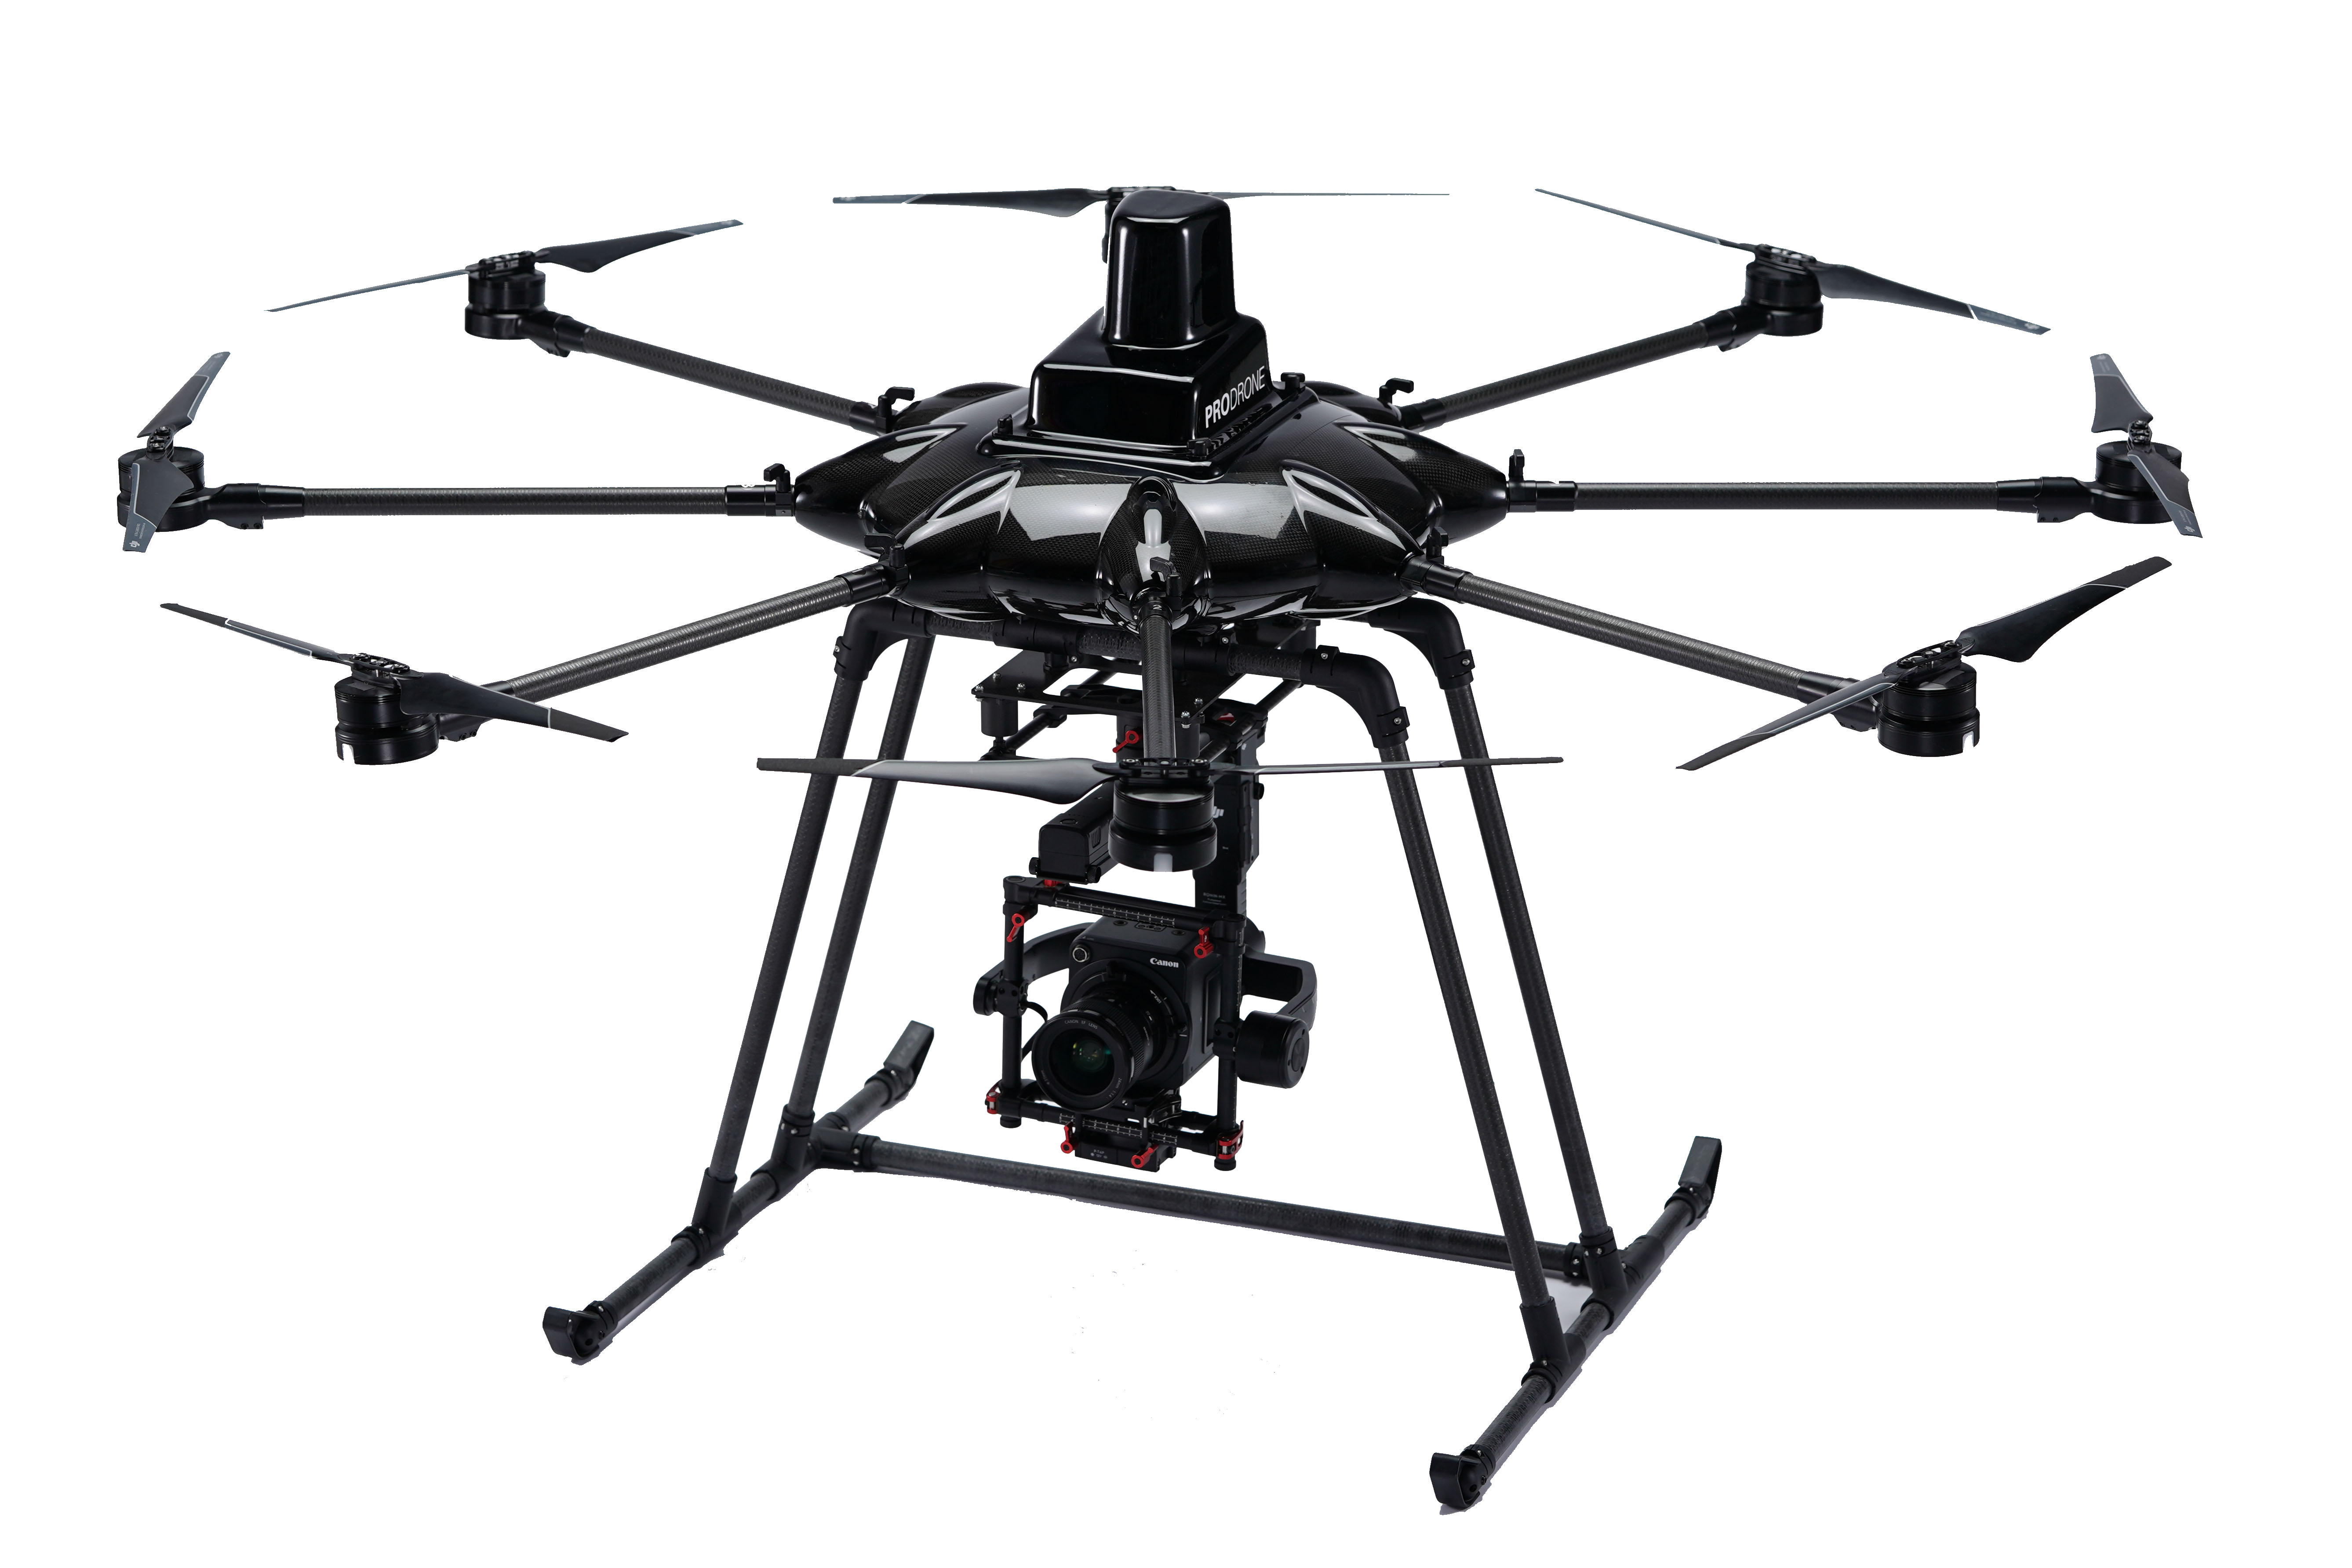 Prodrone Develops the Night Surveyor Drone | Prodrone